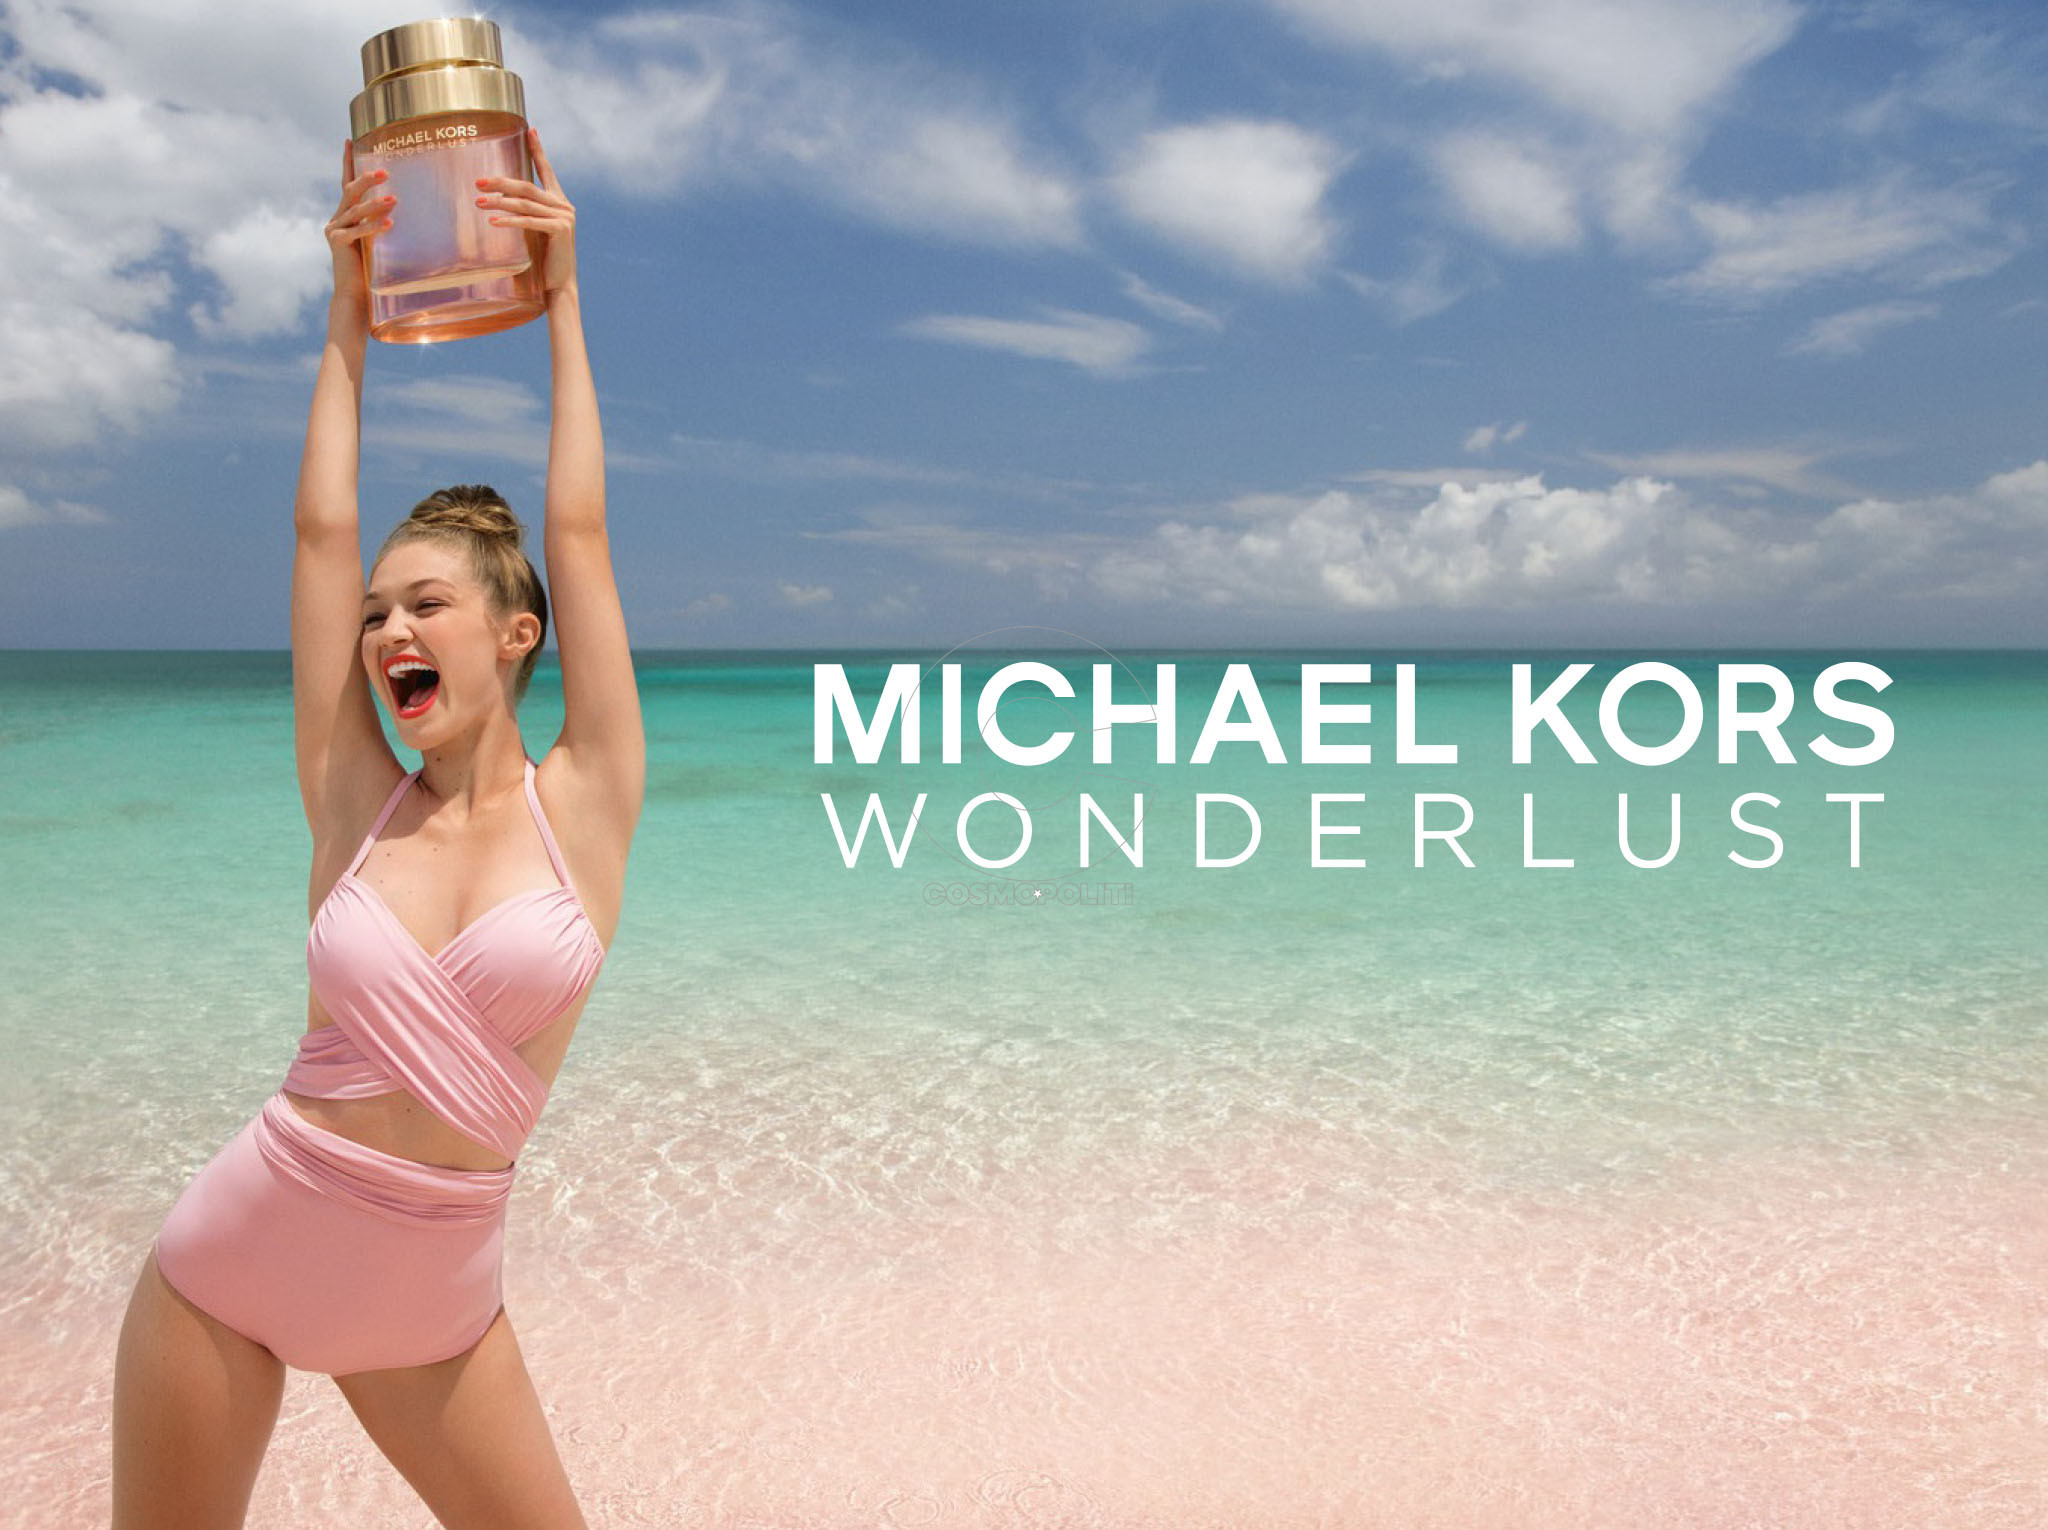 MK_Wonderlust_GIGI_Visual_2048x1530